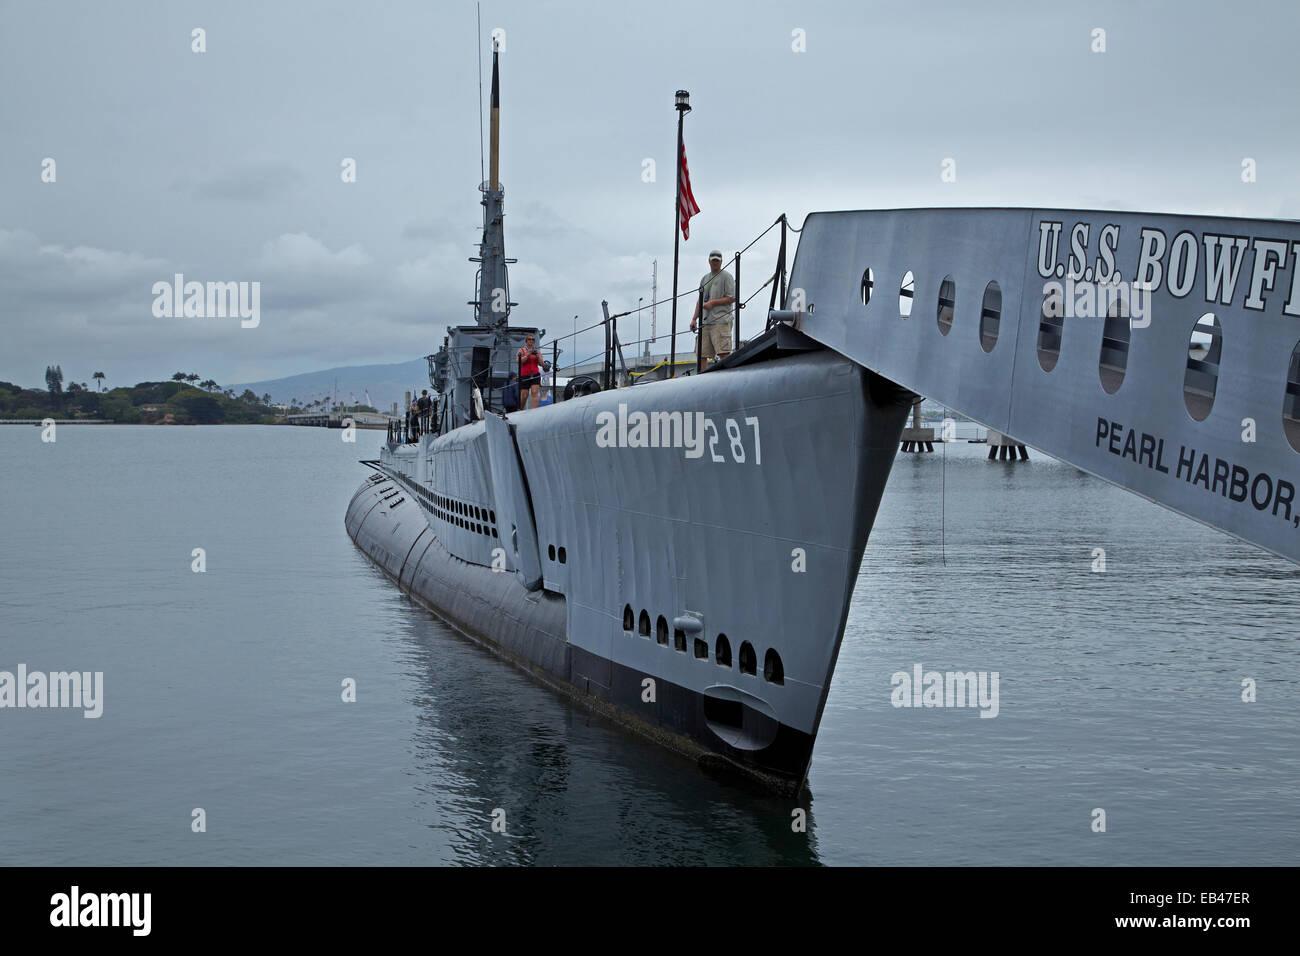 USS Bowfin Submarine (1942), Pearl Harbor, Honolulu, Oahu, Hawaii, EE.UU. Imagen De Stock